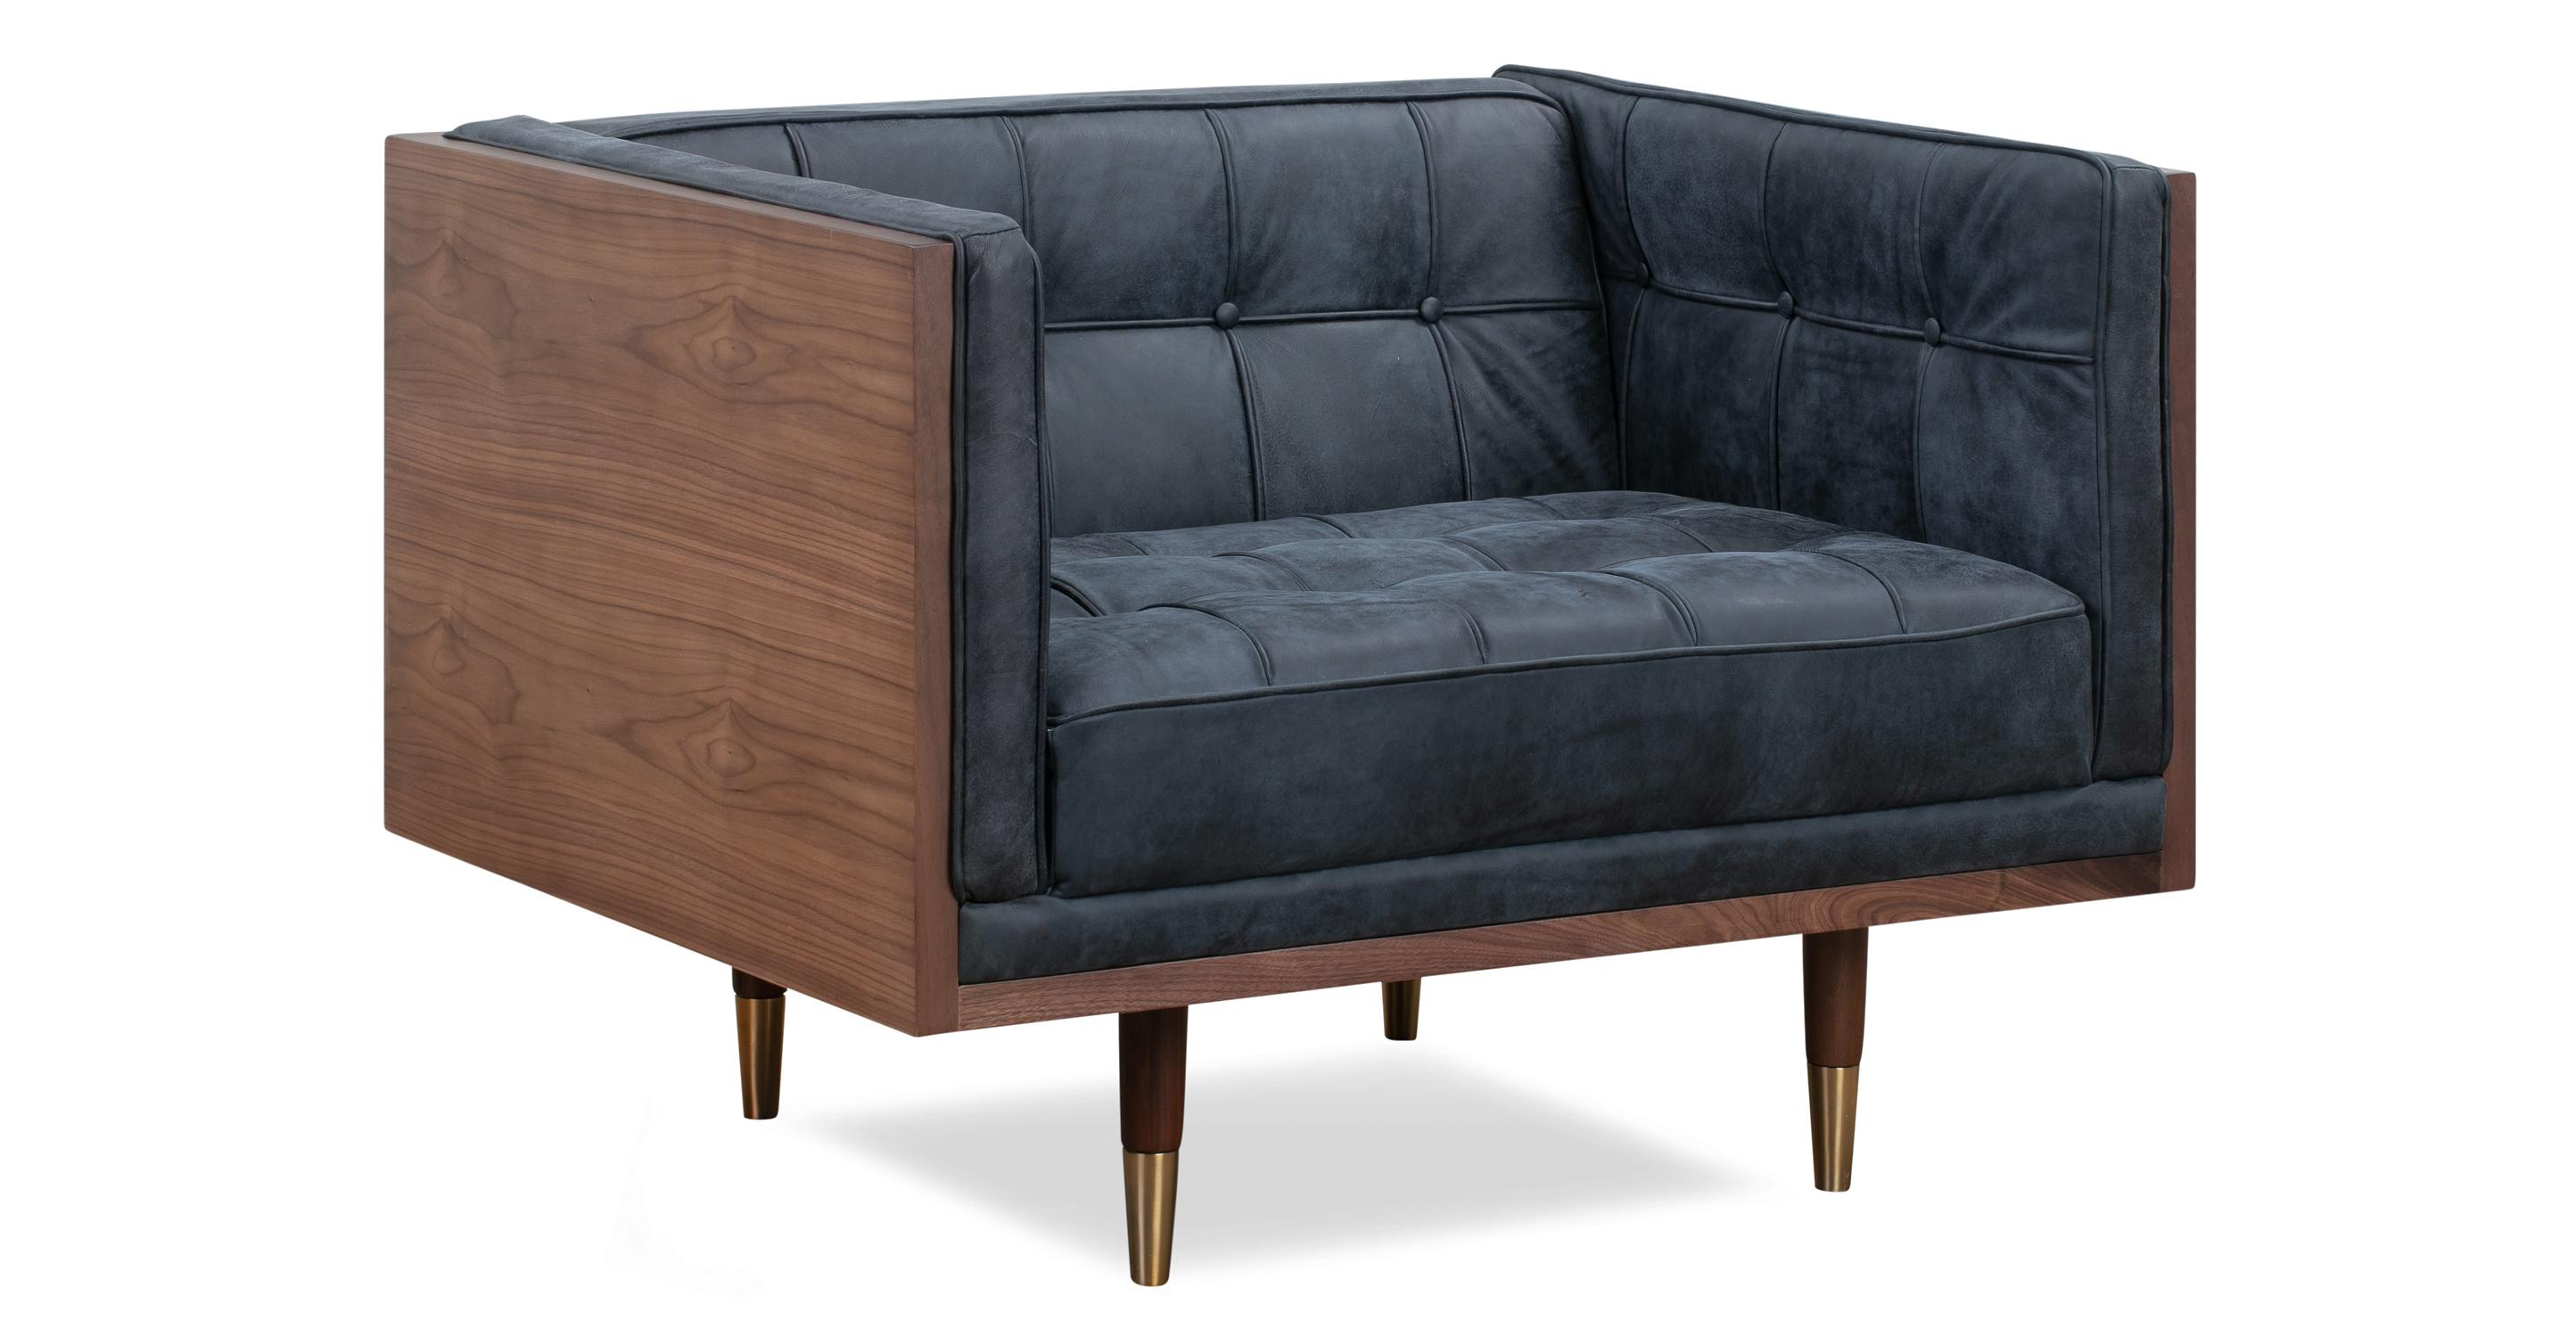 Woodrow Box Leather Chair, Walnut/Night